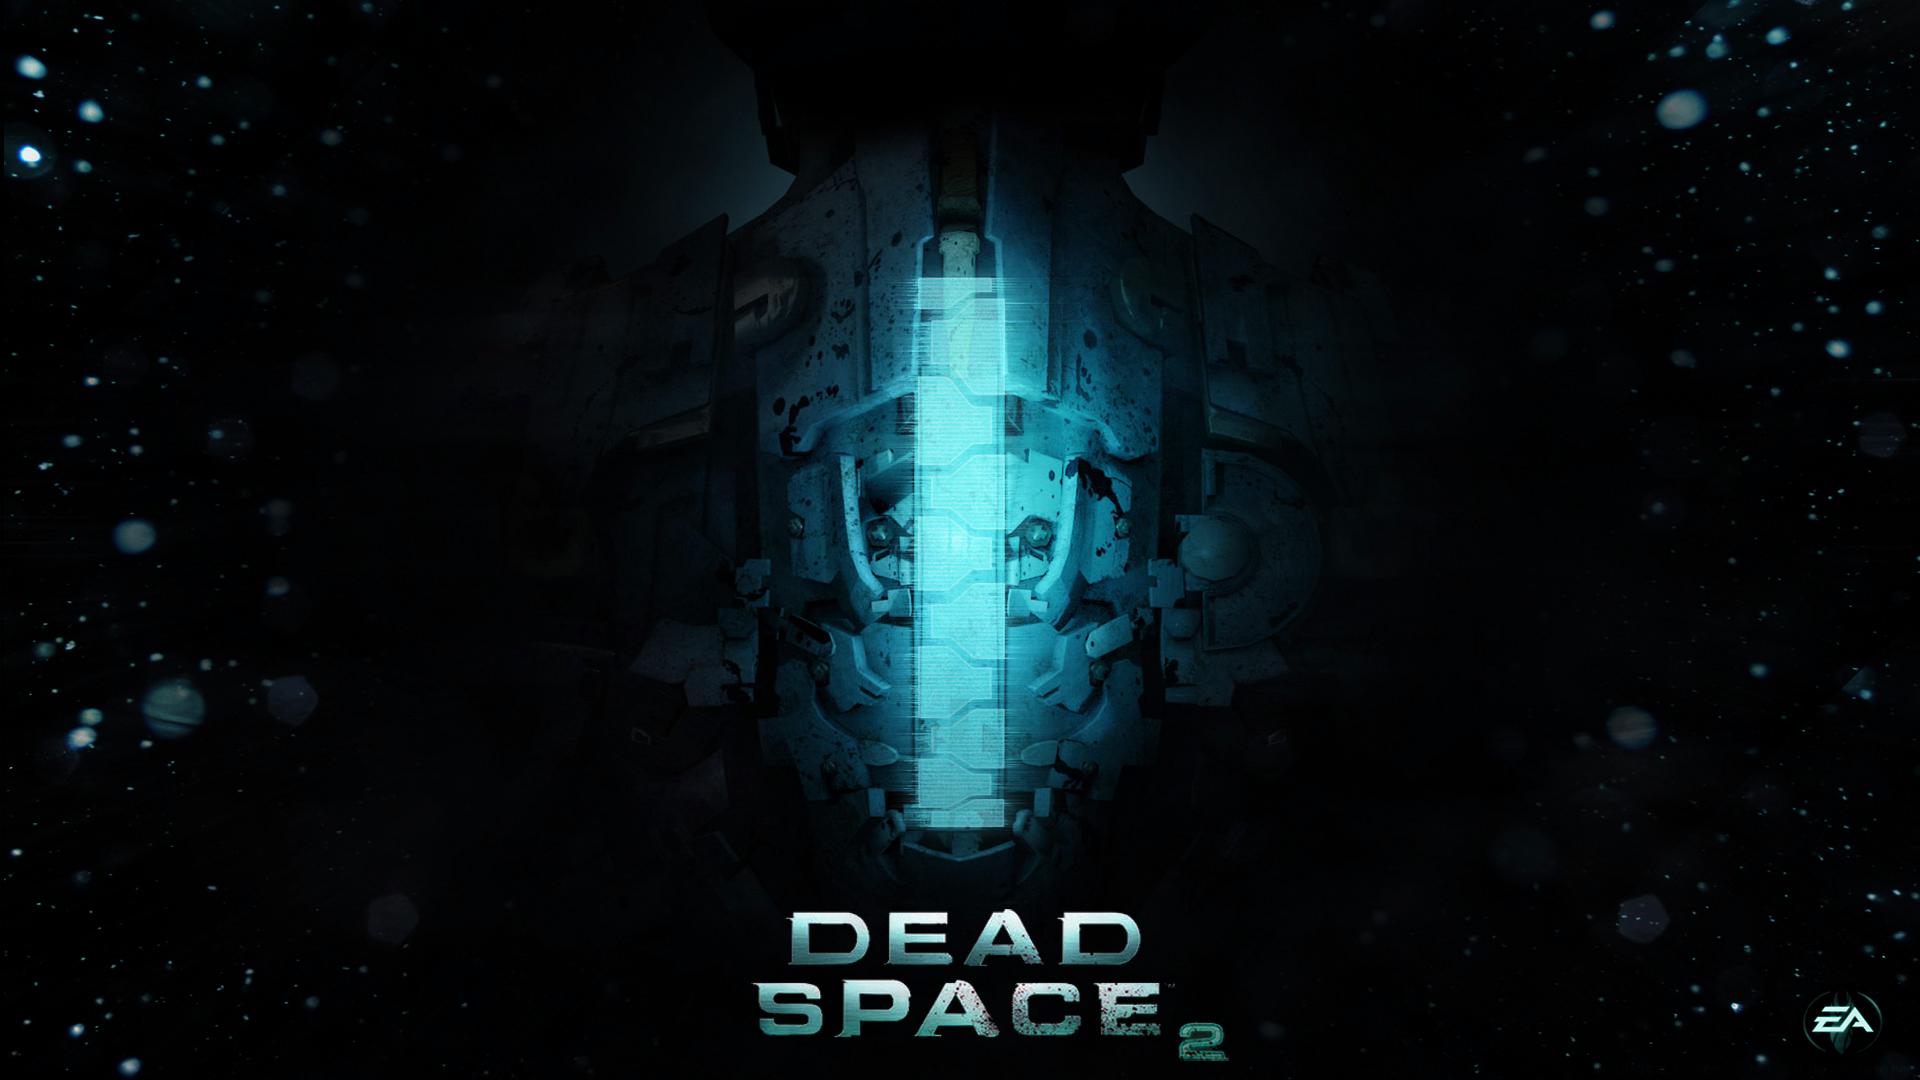 Plasma cutter dead space wallpaper 1277699 - Dead space 3 wallpaper 1080p ...